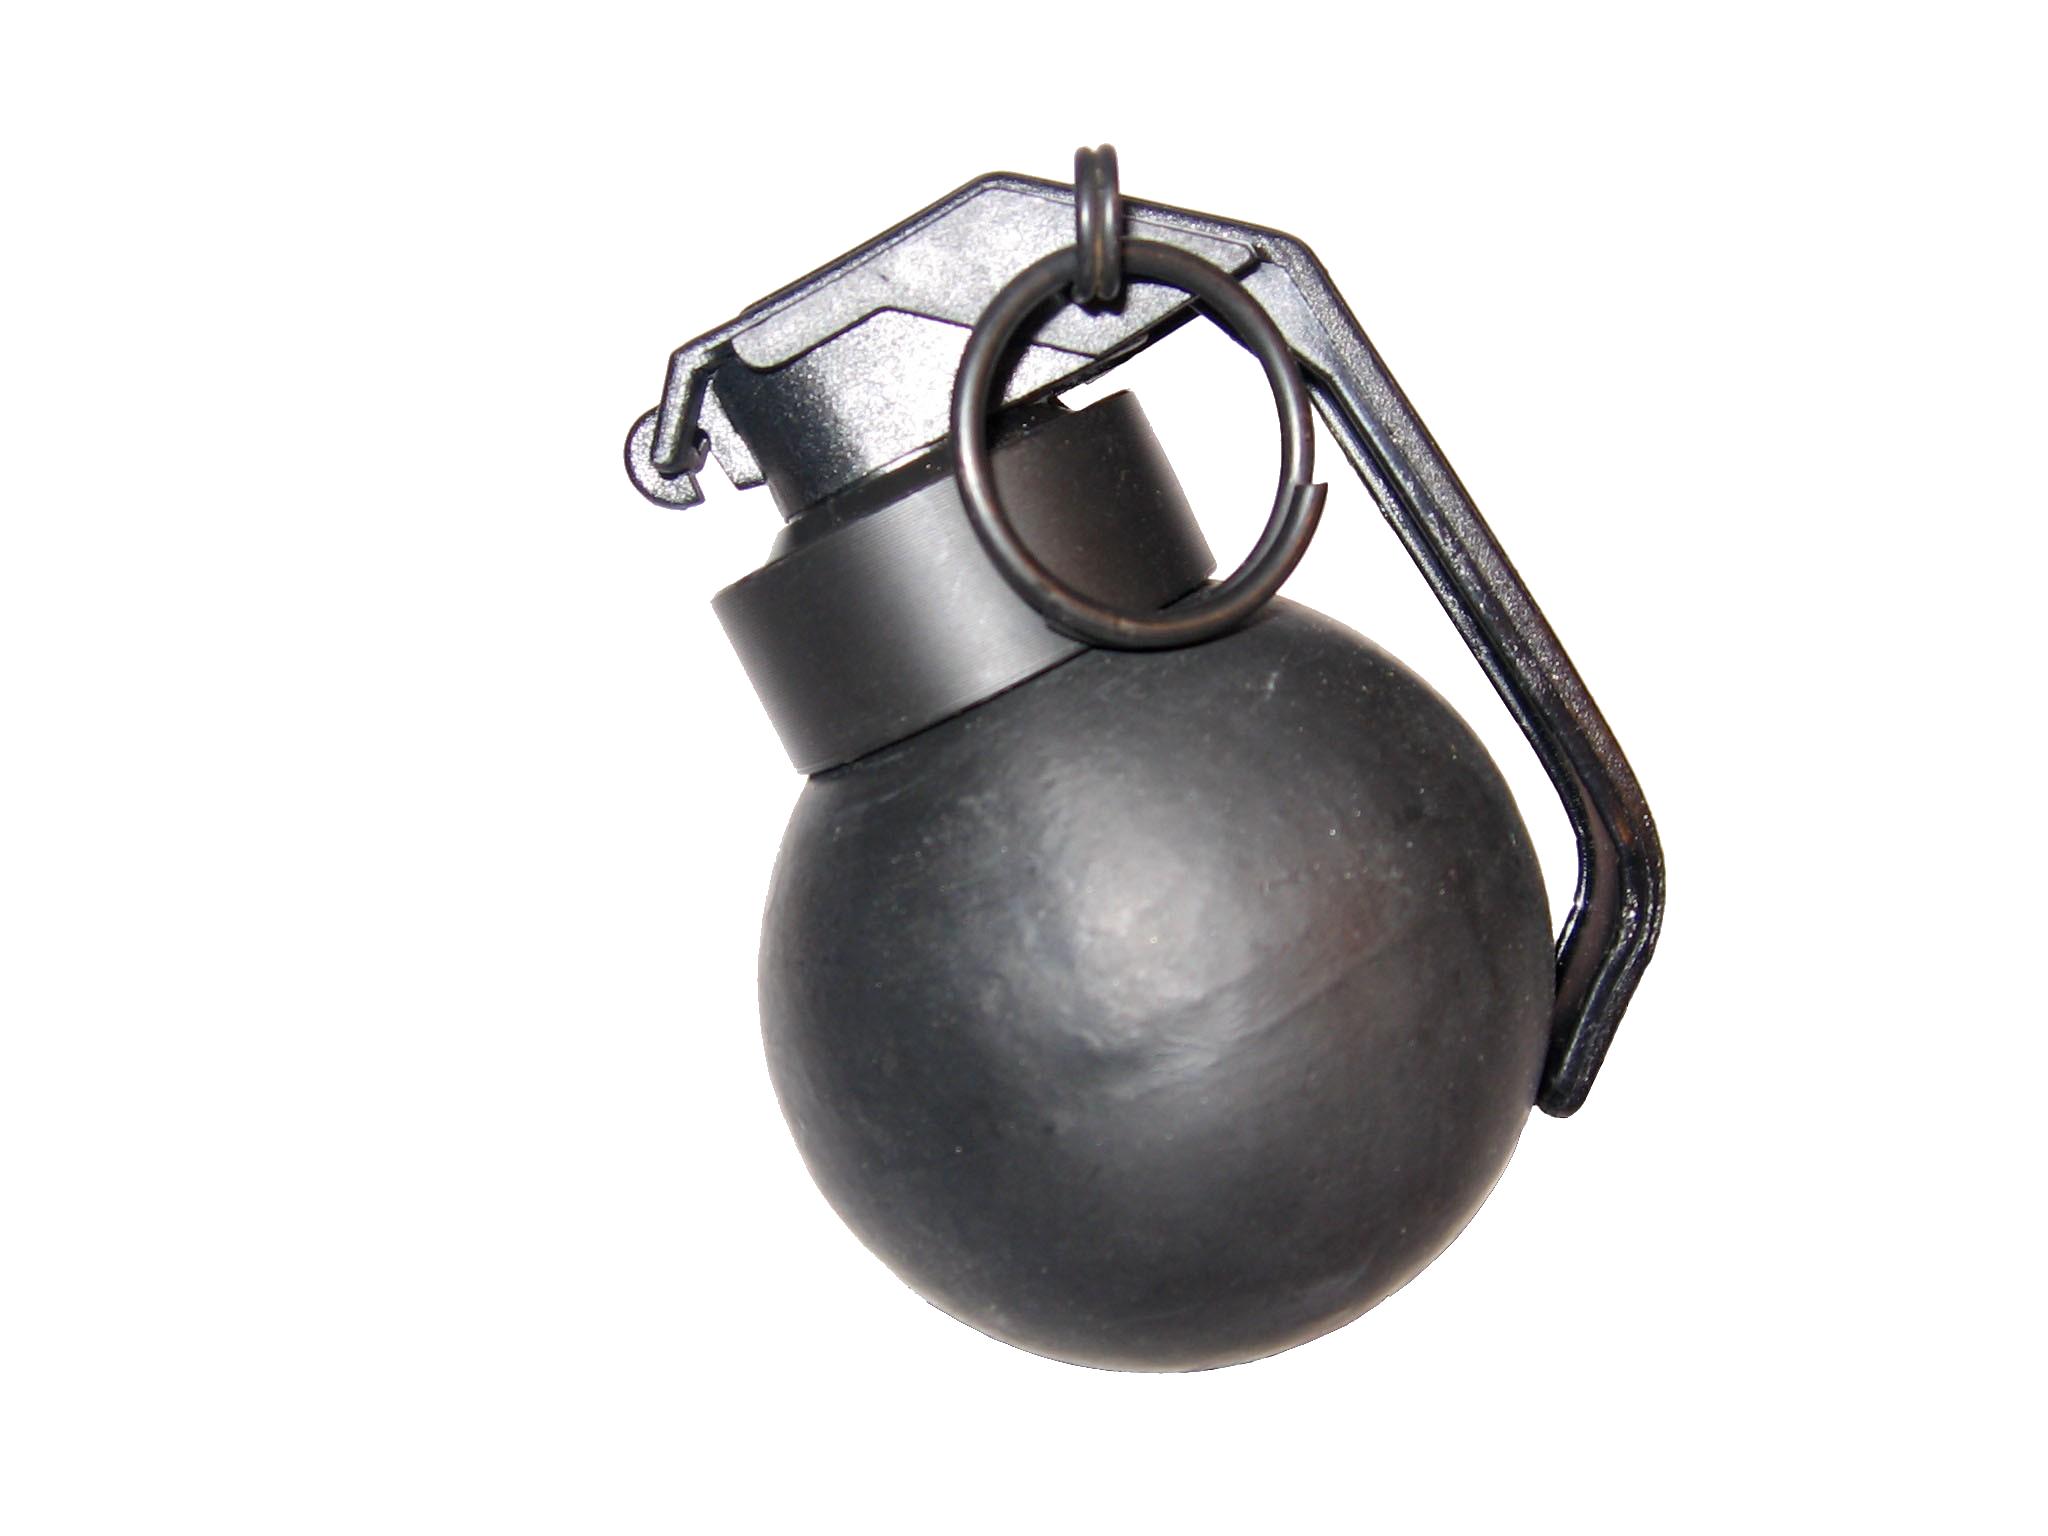 Steel Grenade PNG Image